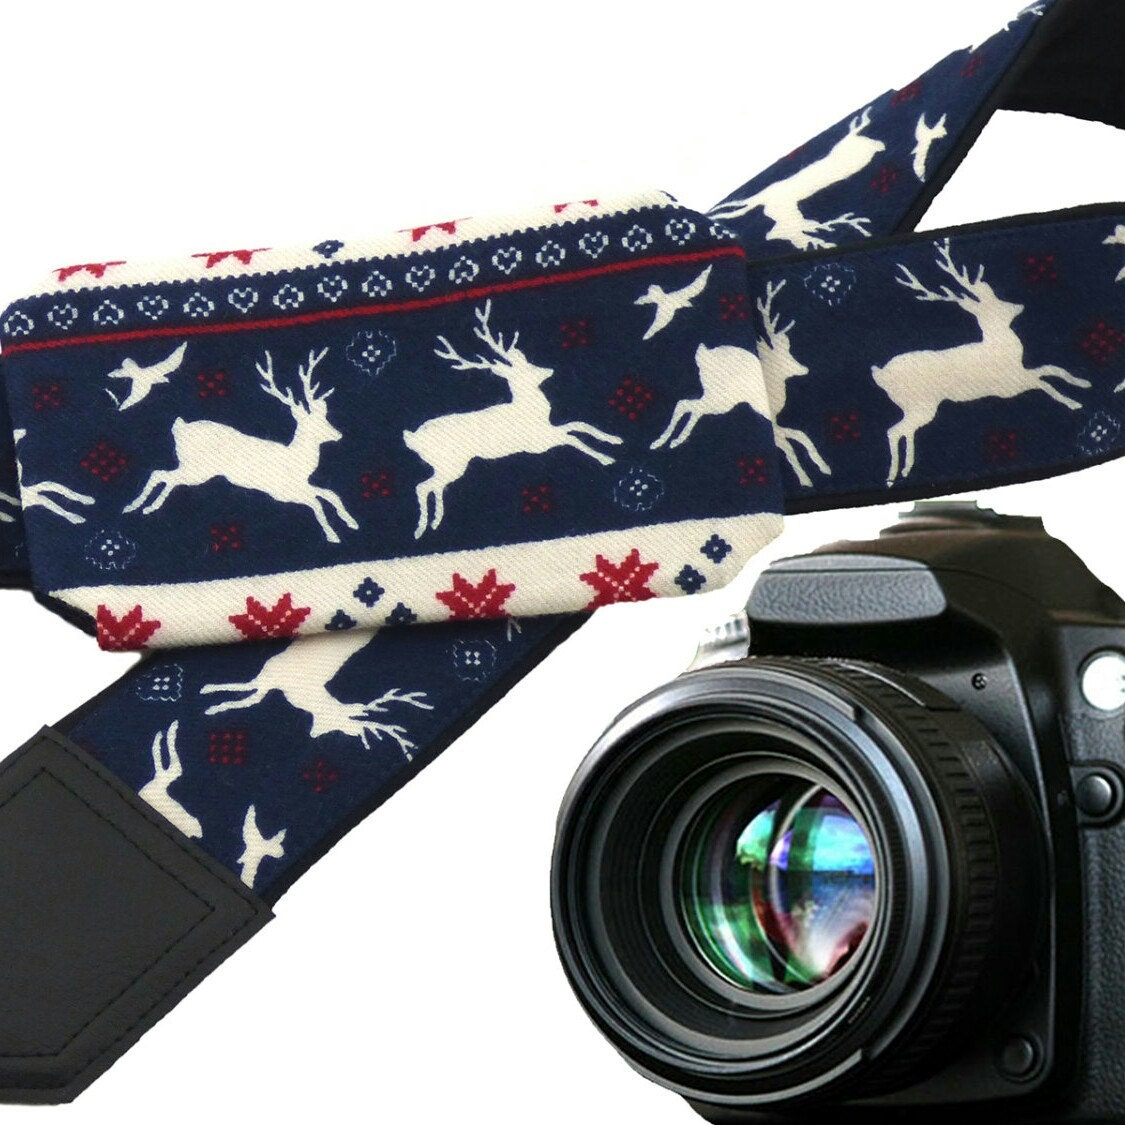 Camera christmas ornaments - Christmas Camera Strap With Lens Pocket Deer Camera Strap White Reindeer Blue And Red Christmas Ornaments Christmas Gifts Xmas Fashion